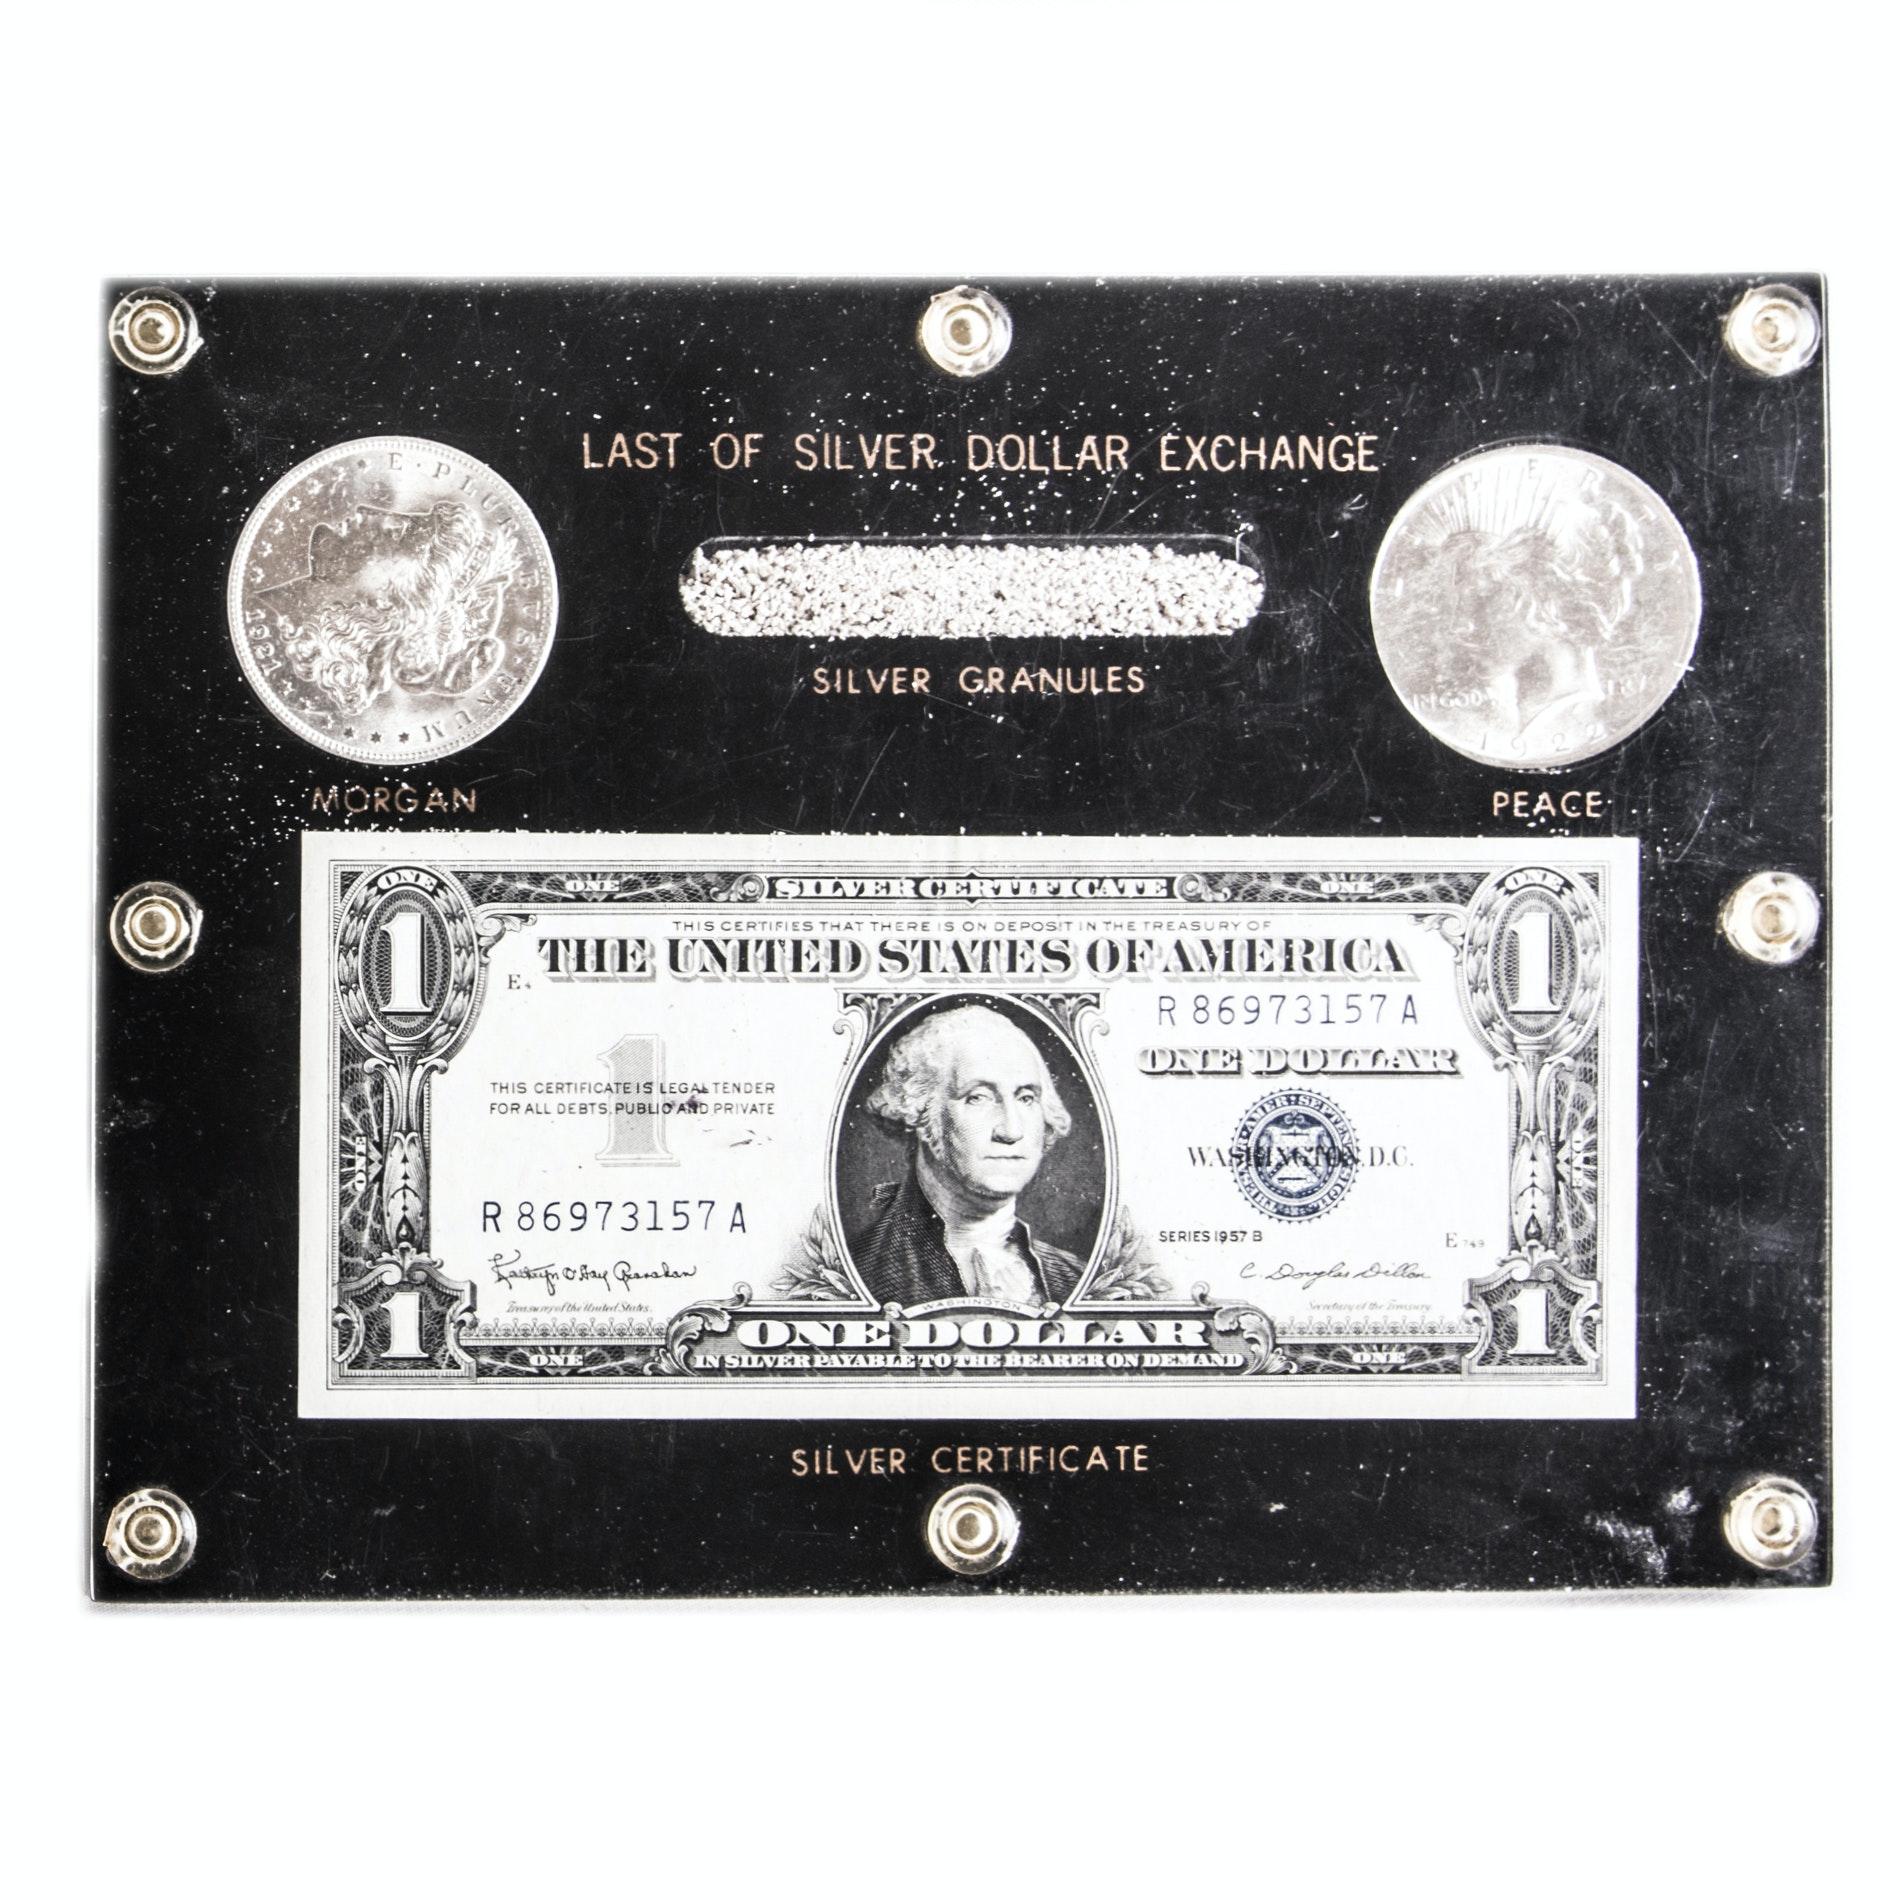 Last of Silver Dollar Exchange